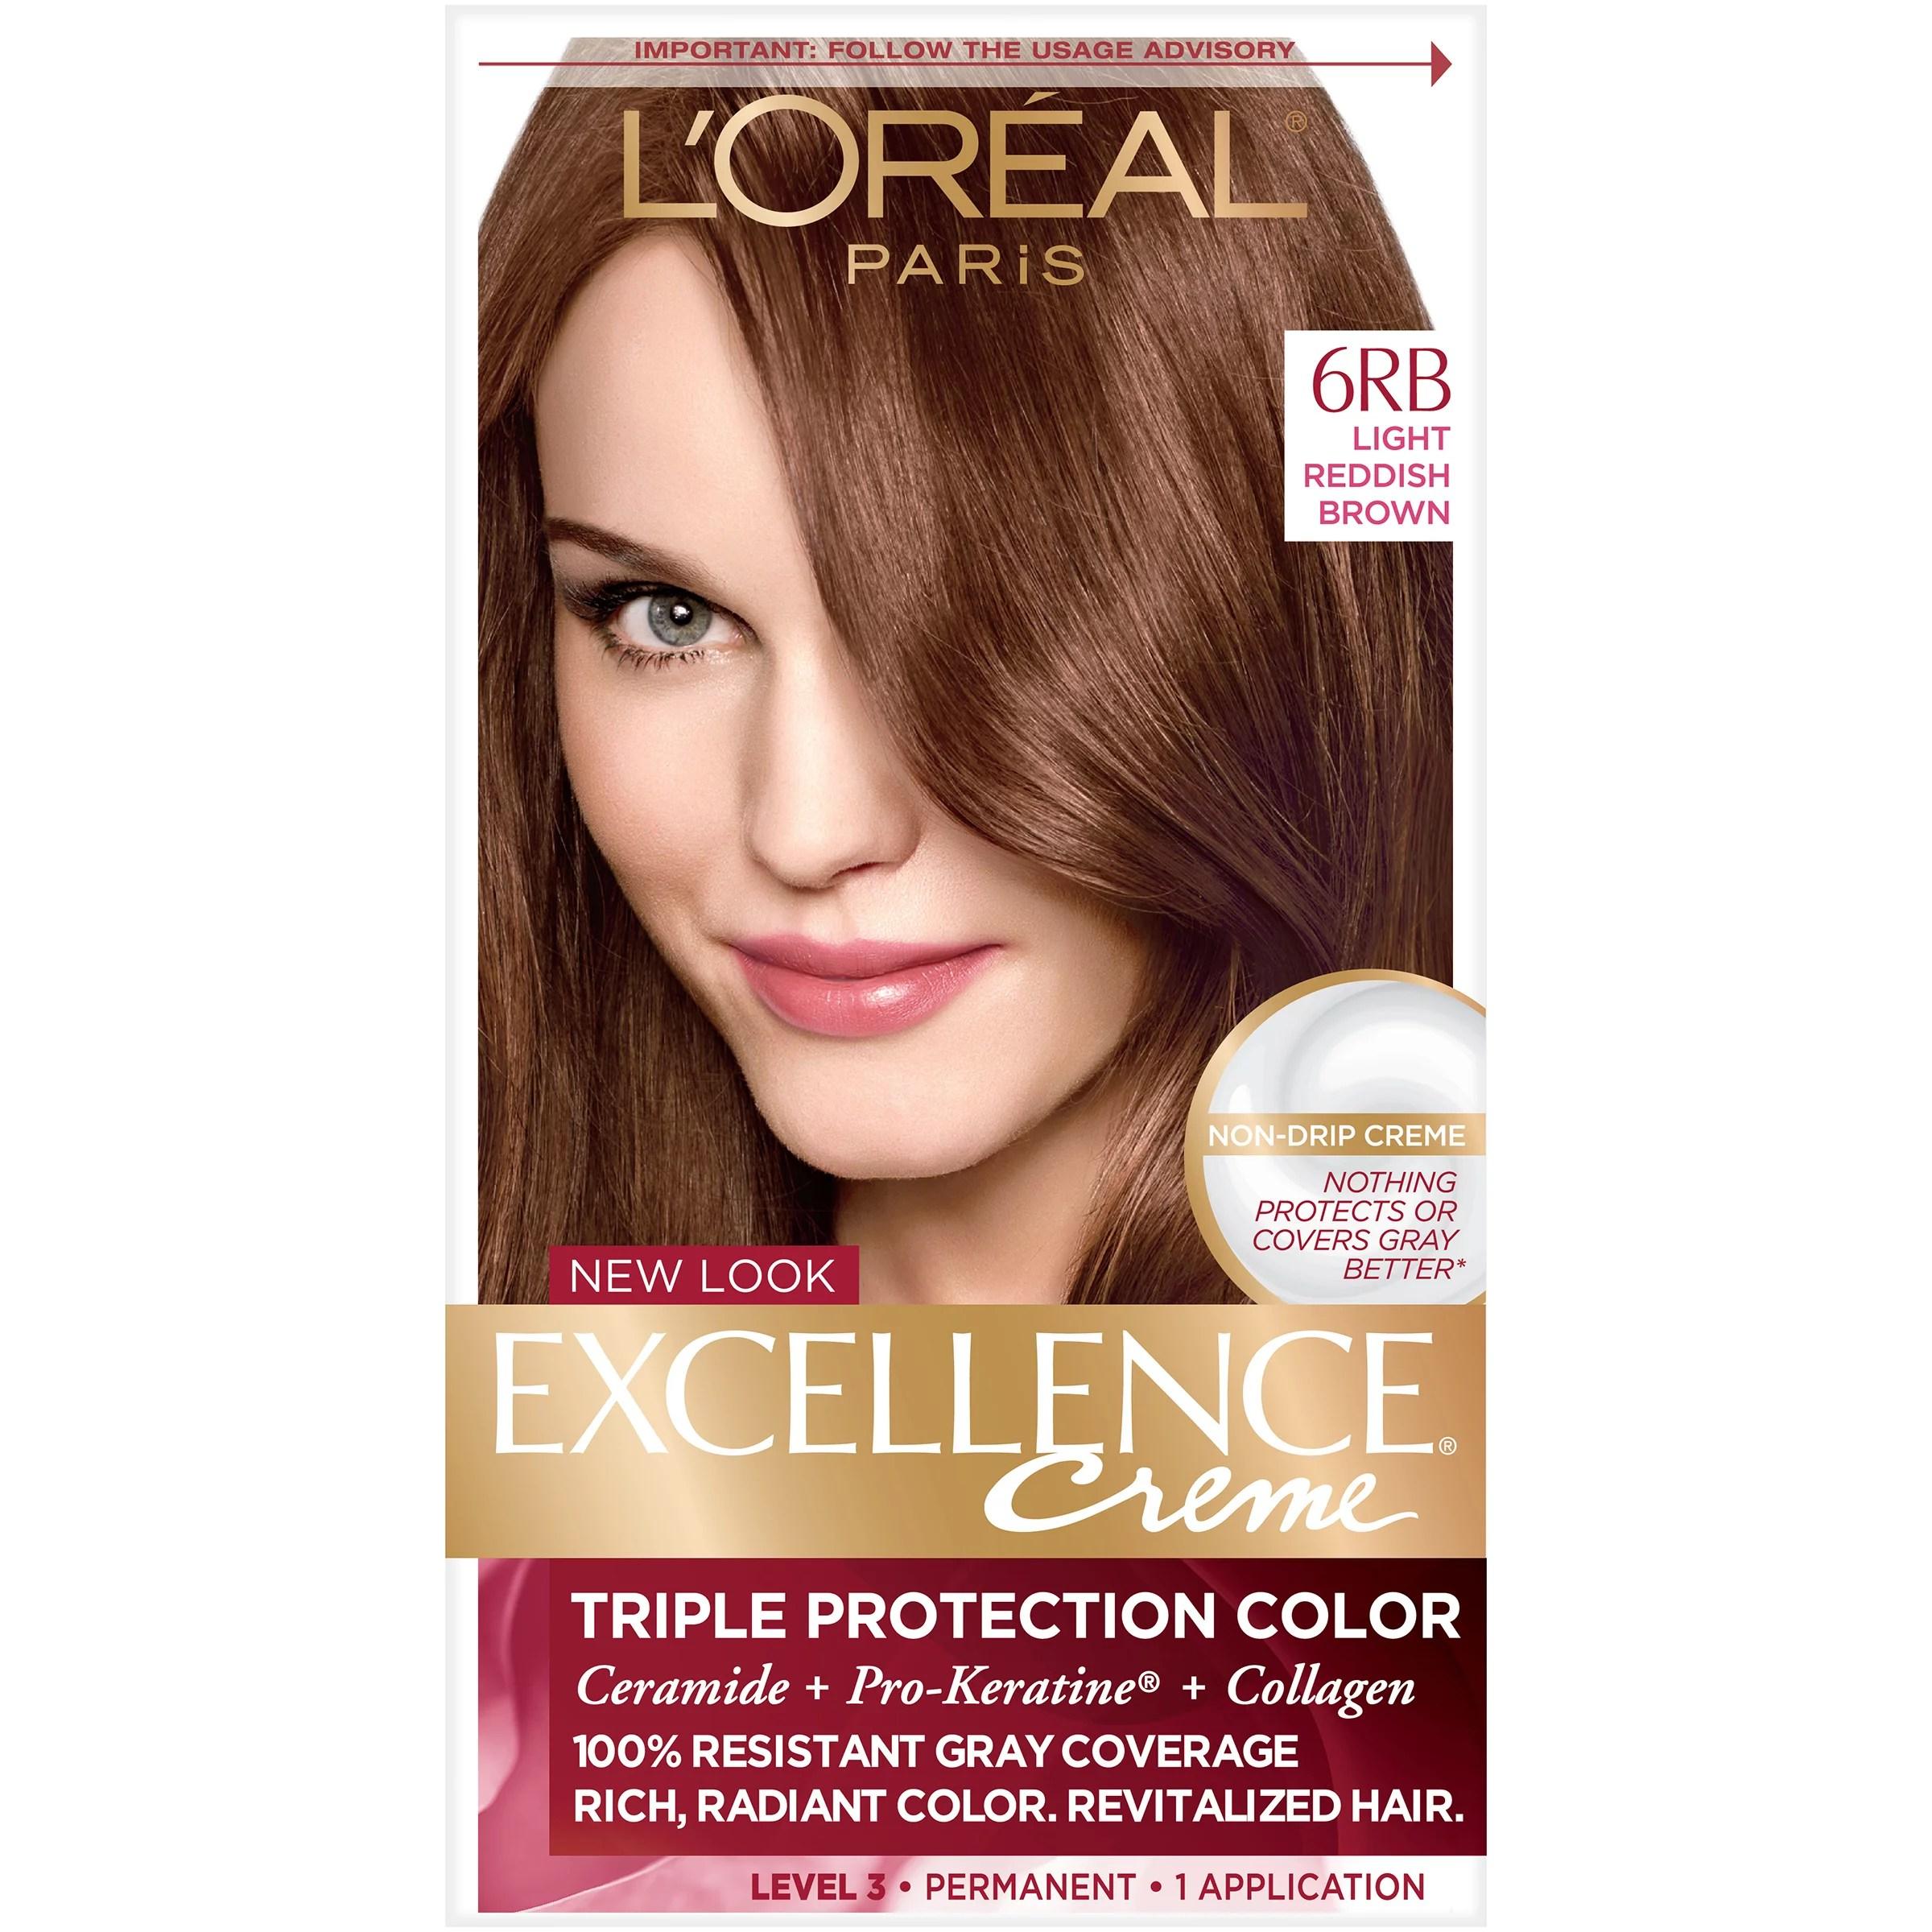 L'Oreal Paris Excellence Creme Permanent Triple Protection Hair Color, 6RB Light Reddish Brown, 1 kit